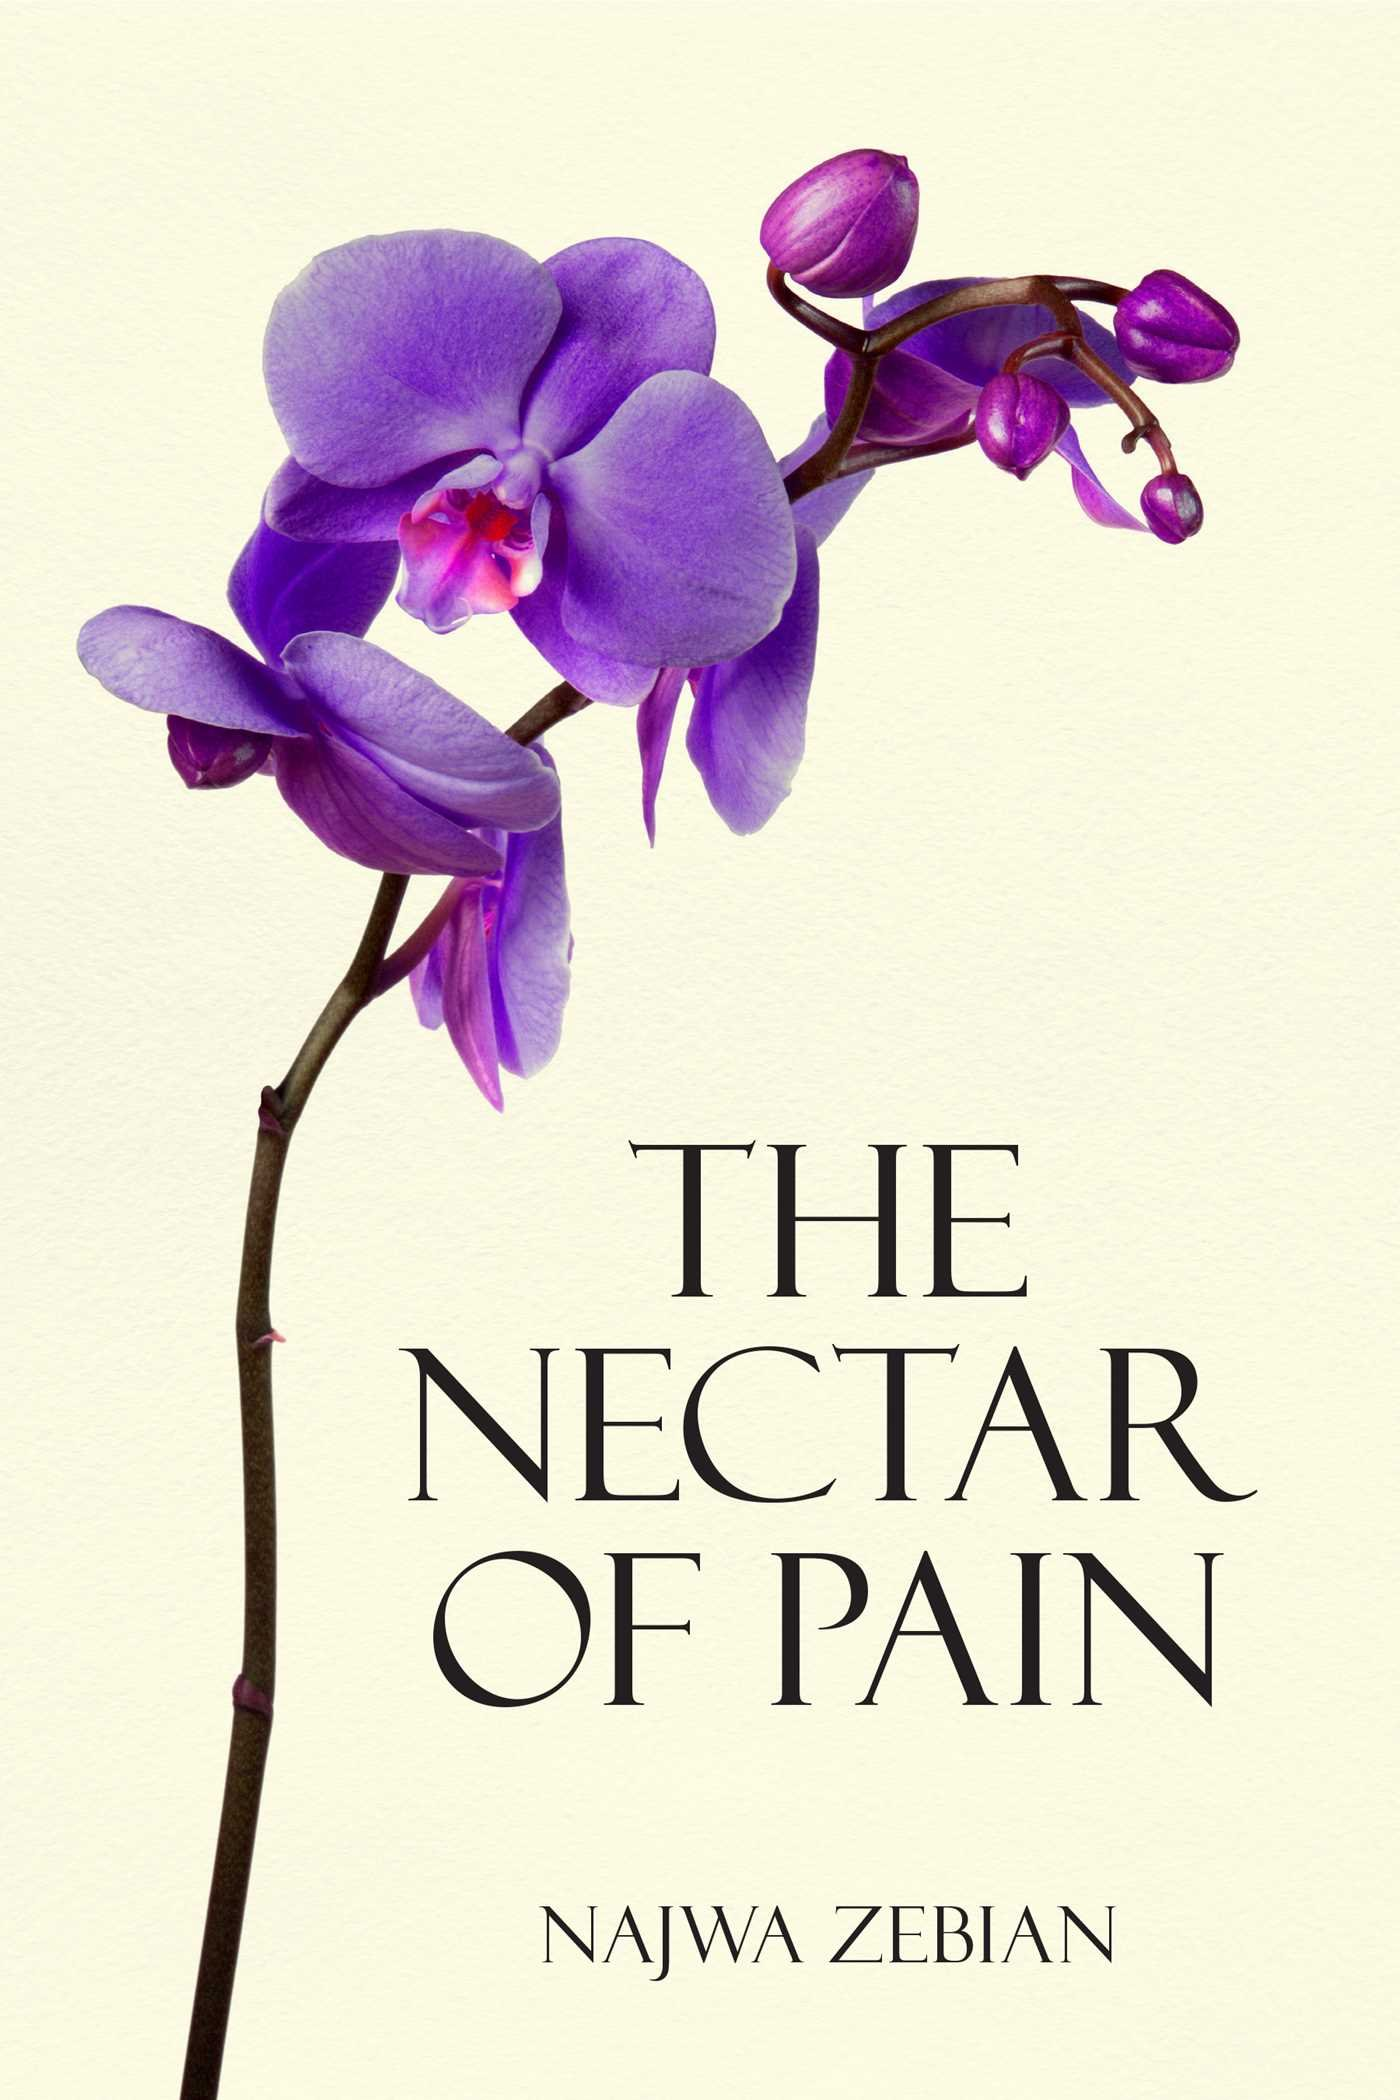 Brain imaging is illuminating the neural patterns behind pain's infinite variety.